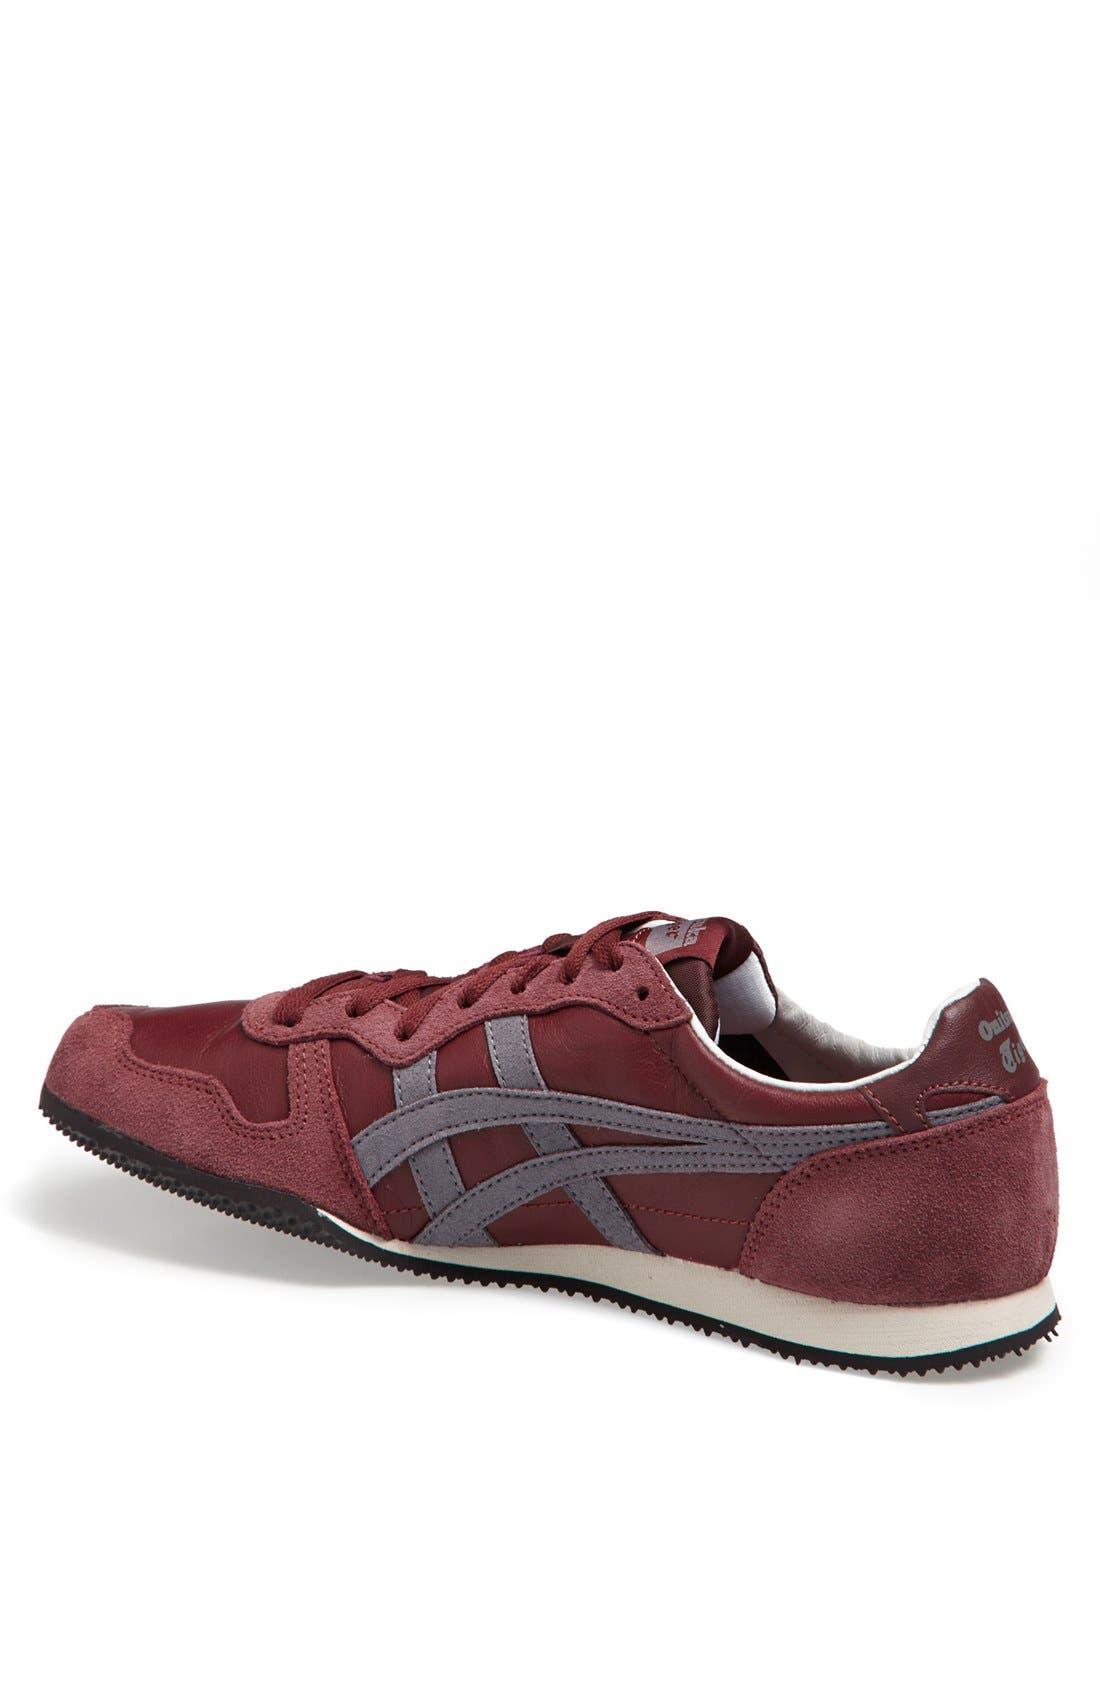 'Serrano' Sneaker,                             Alternate thumbnail 2, color,                             Burgundy/ Grey